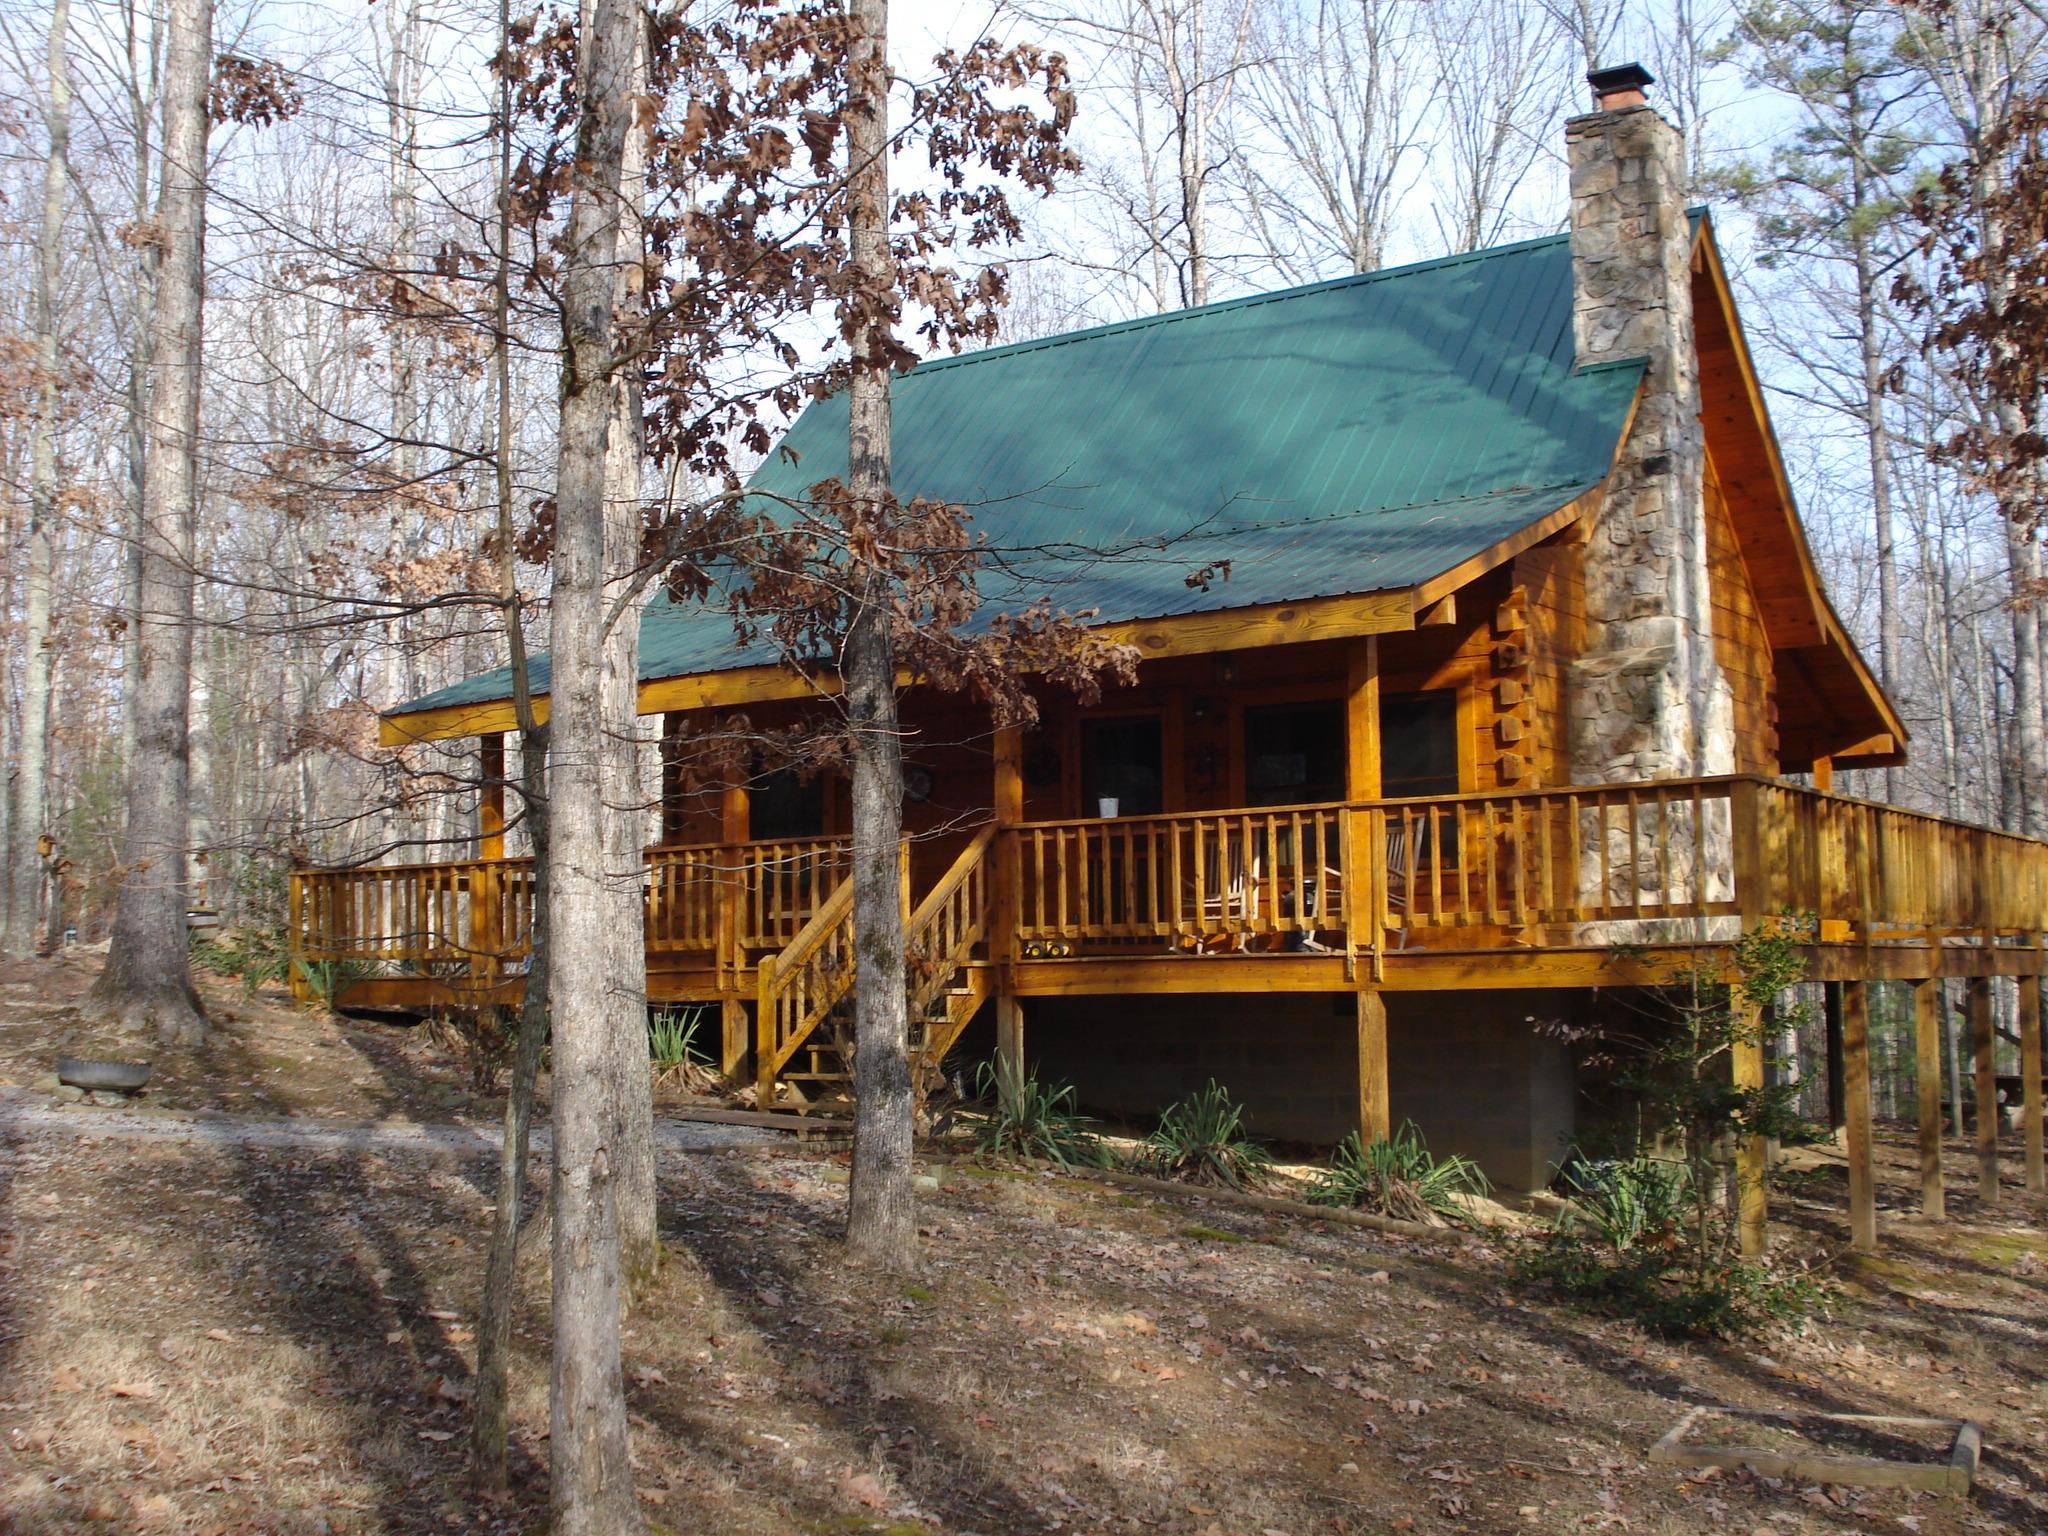 Turkey Scratch cabin